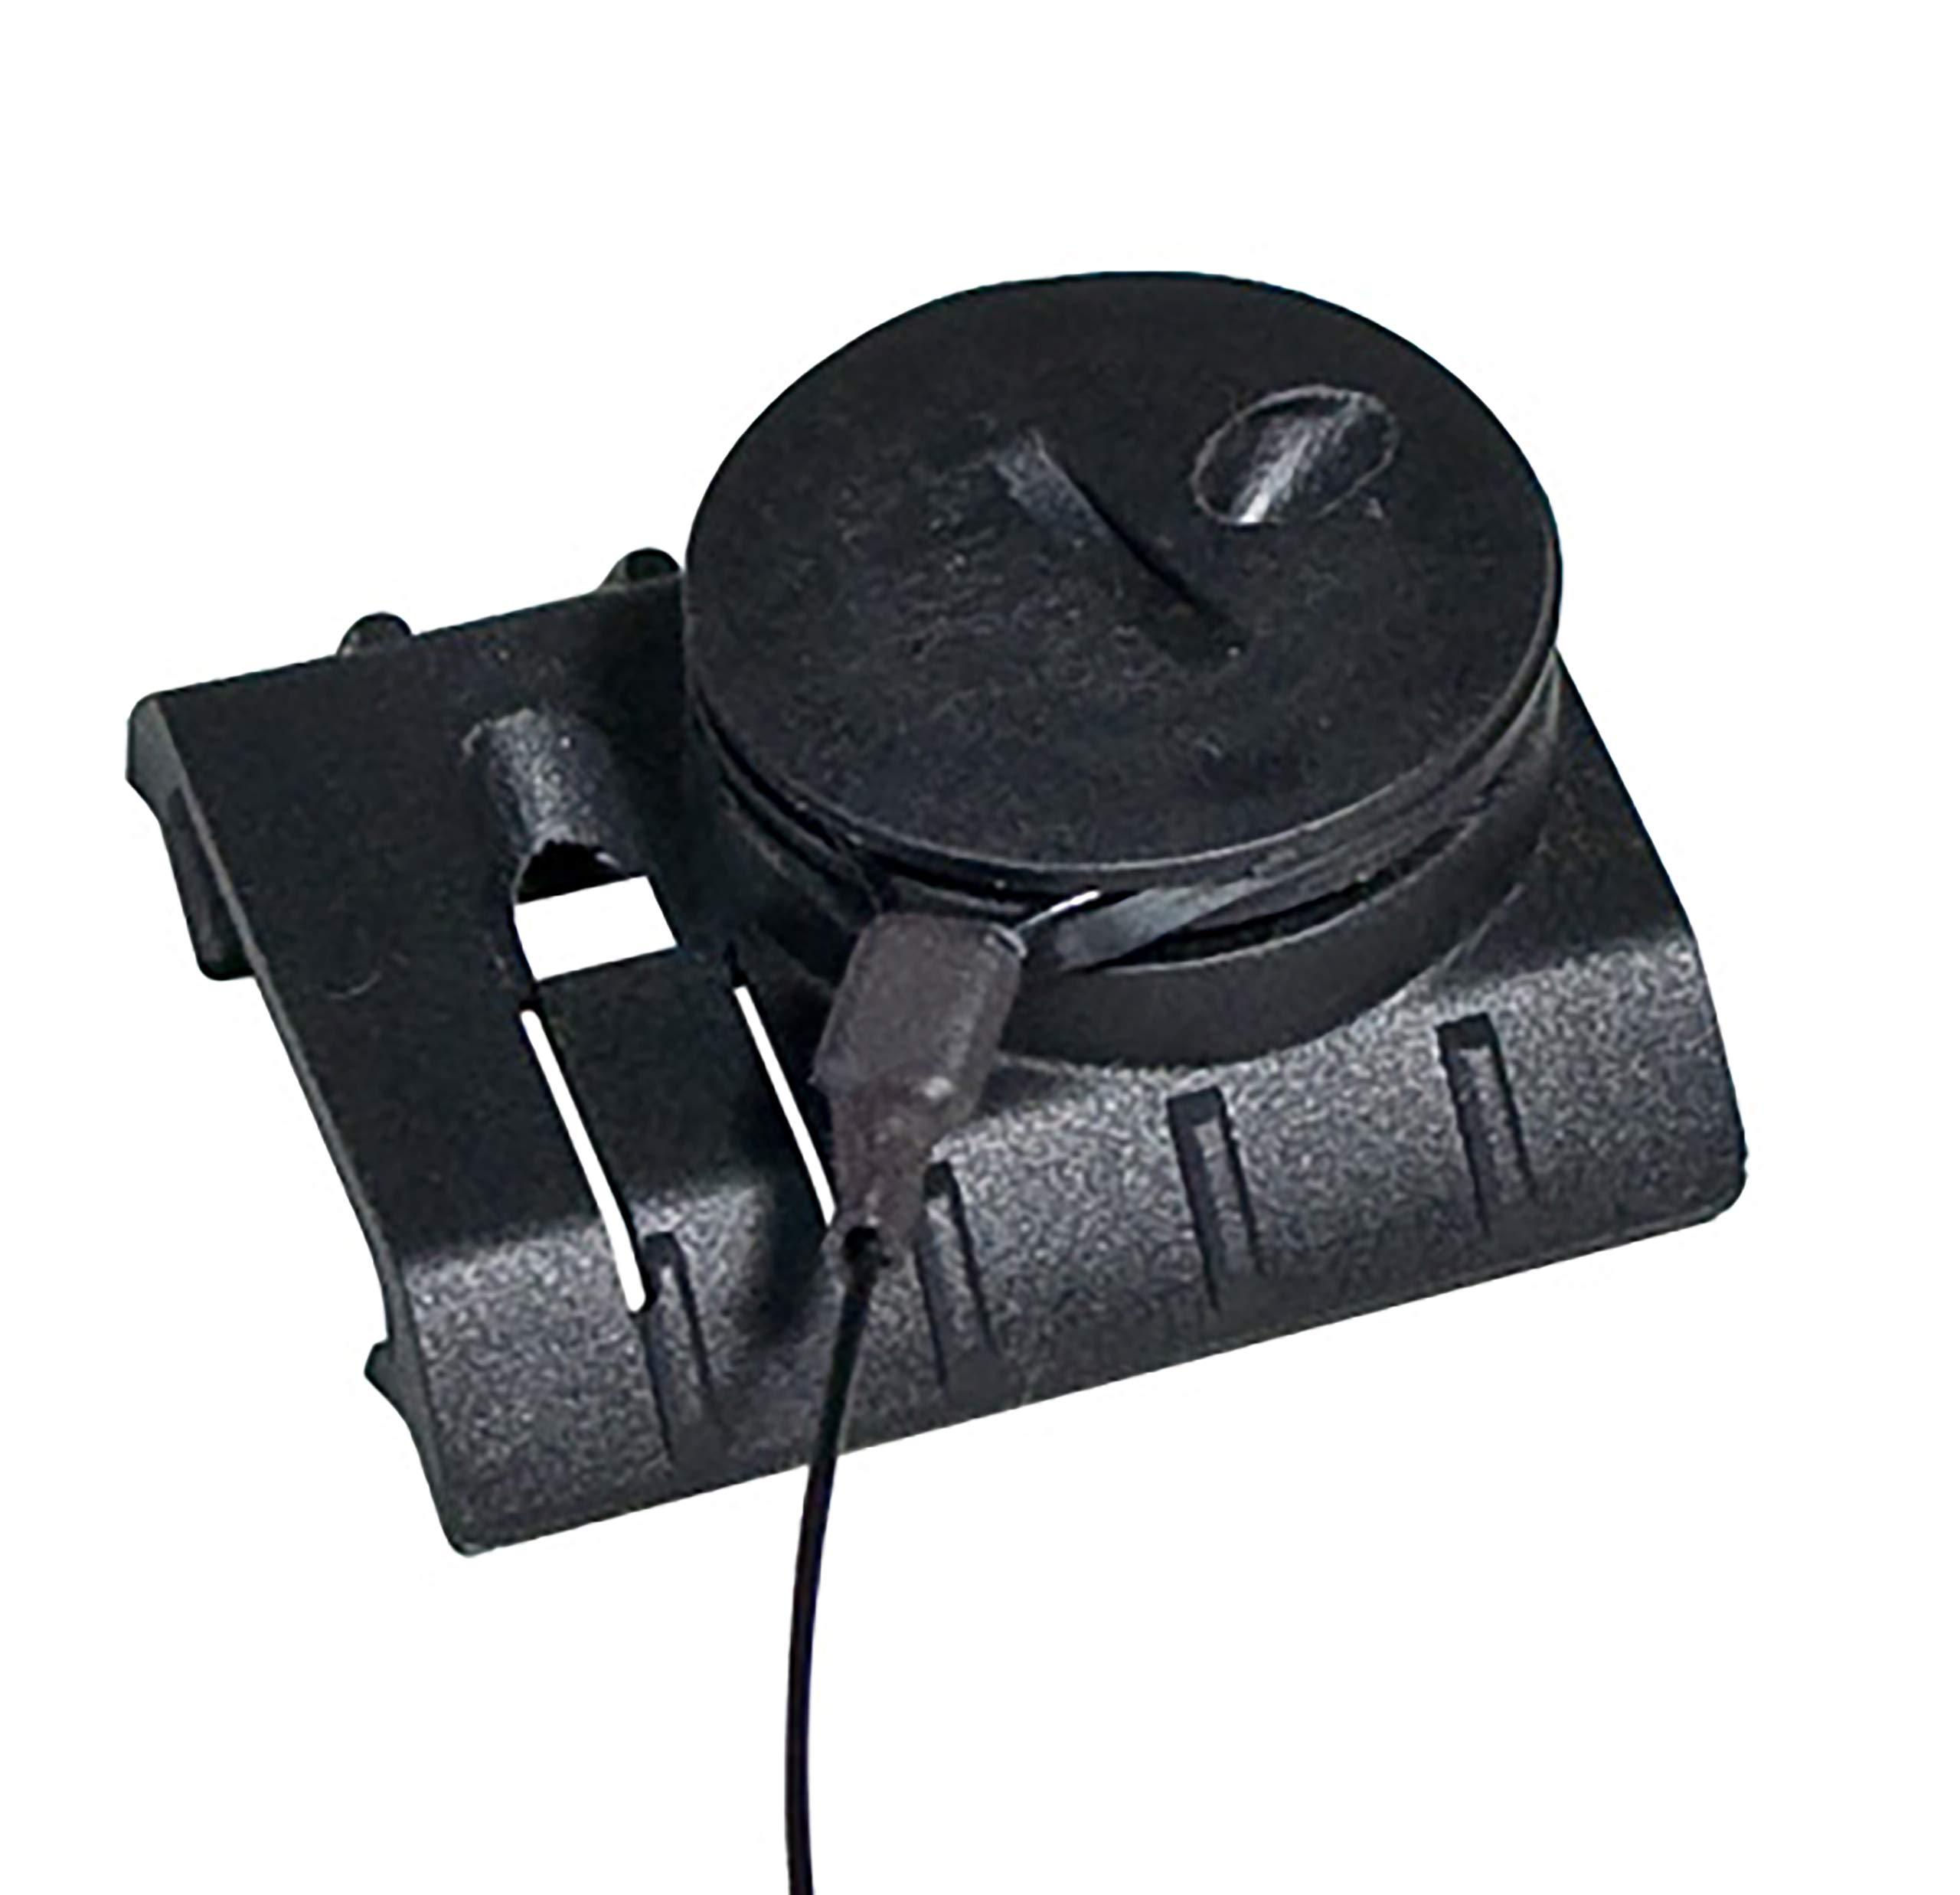 Vortex Optics Riflescope Battery Holders